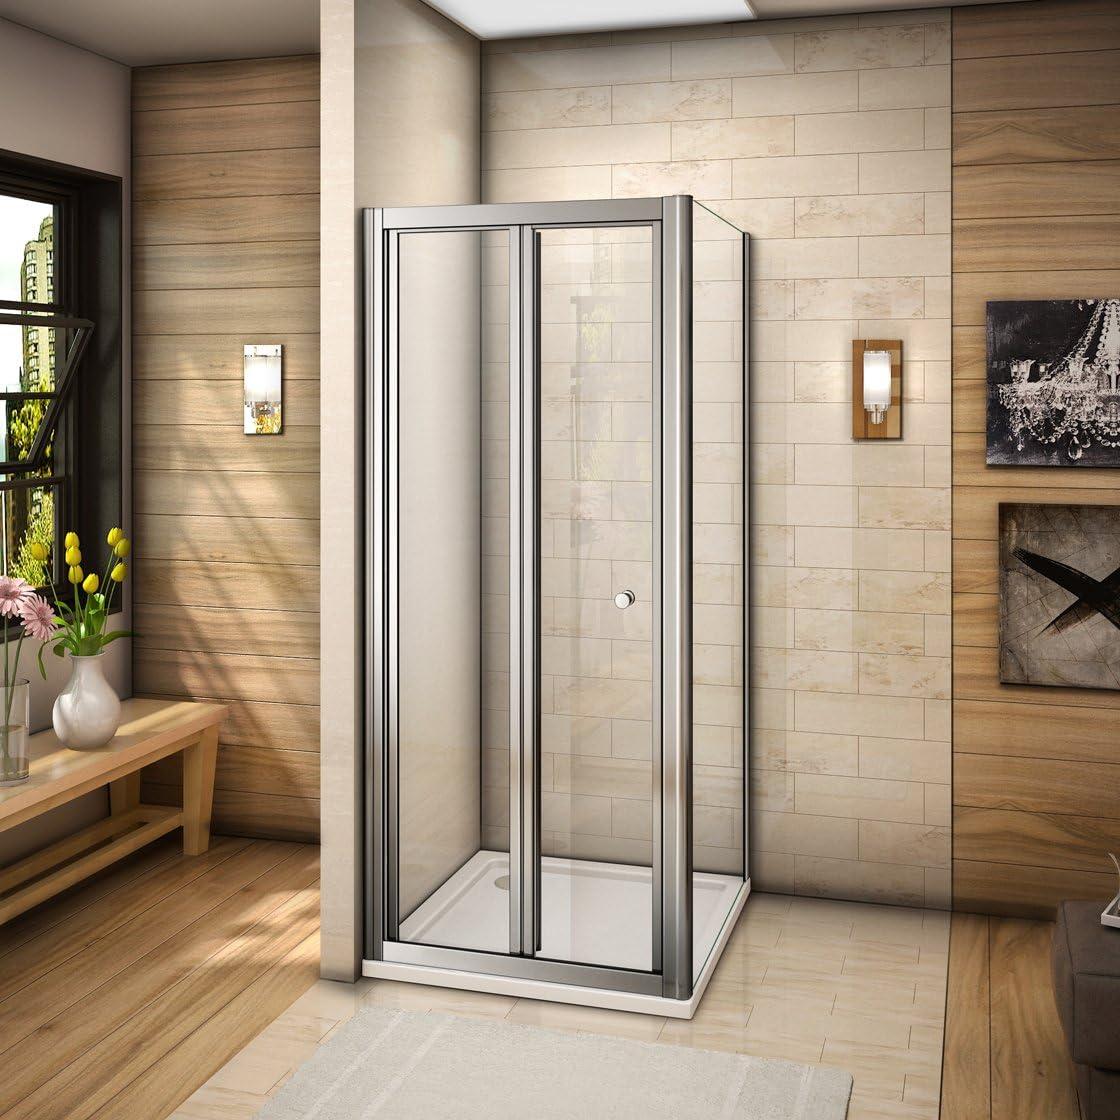 Mamparas de ducha cabina de ducha plegable puerta + lateral fijo ...